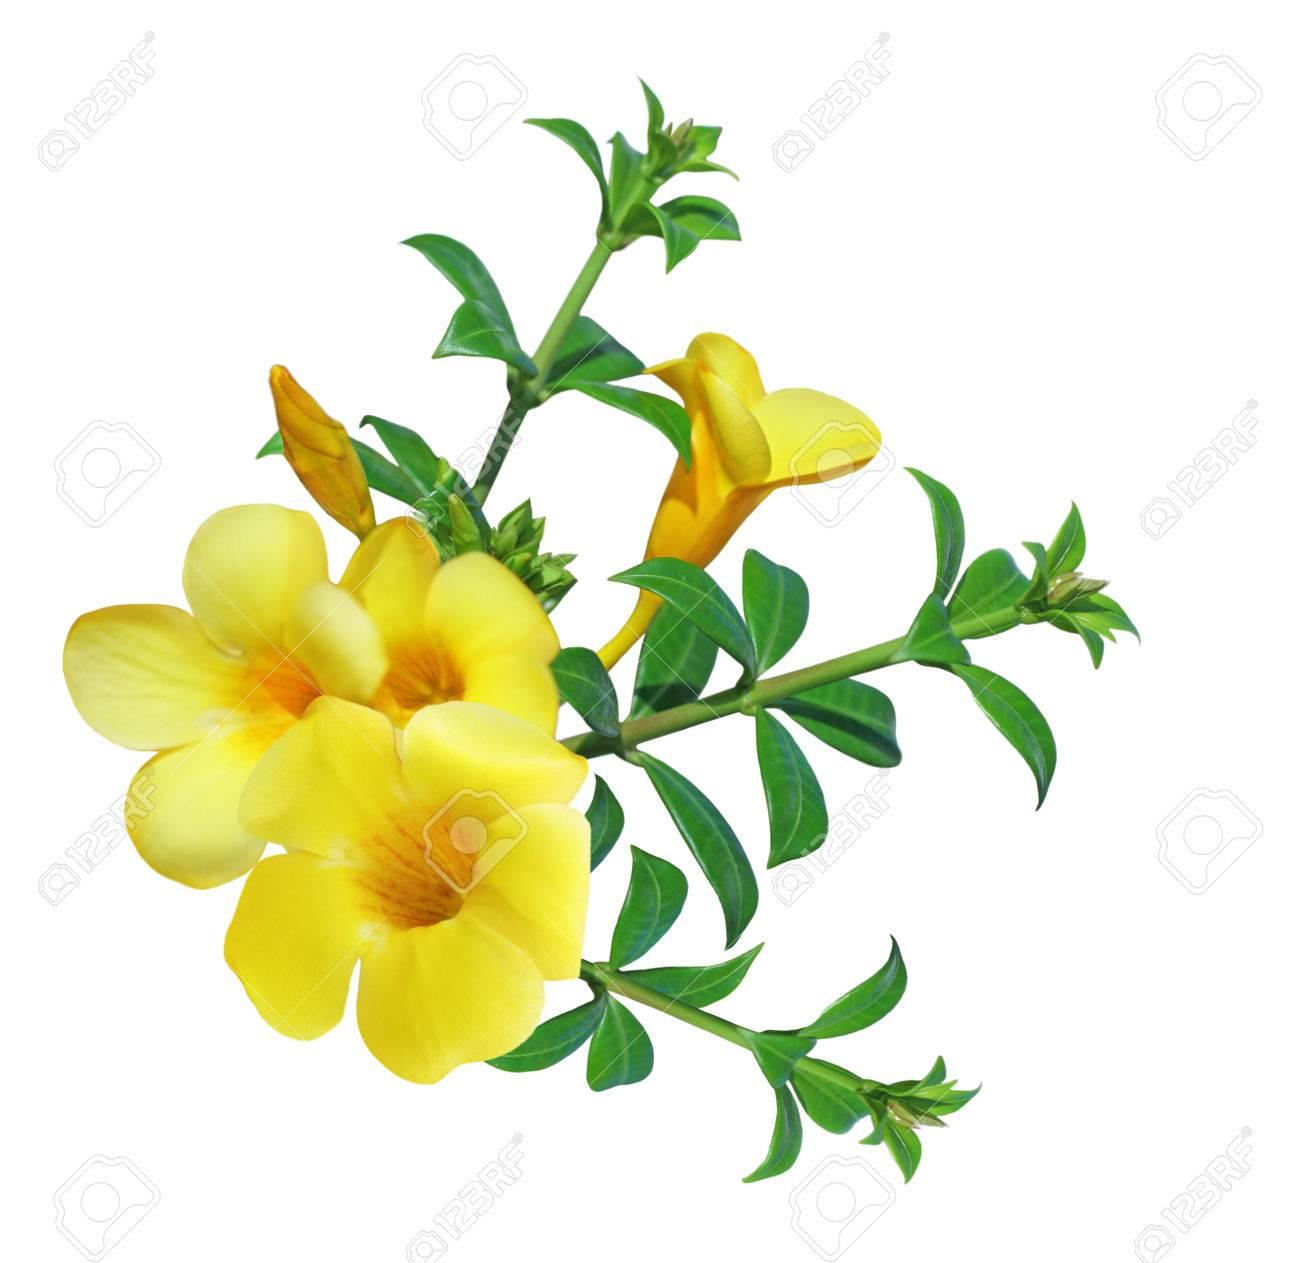 Allamanda Flower Yellow Bell Isolated On White Background Stock